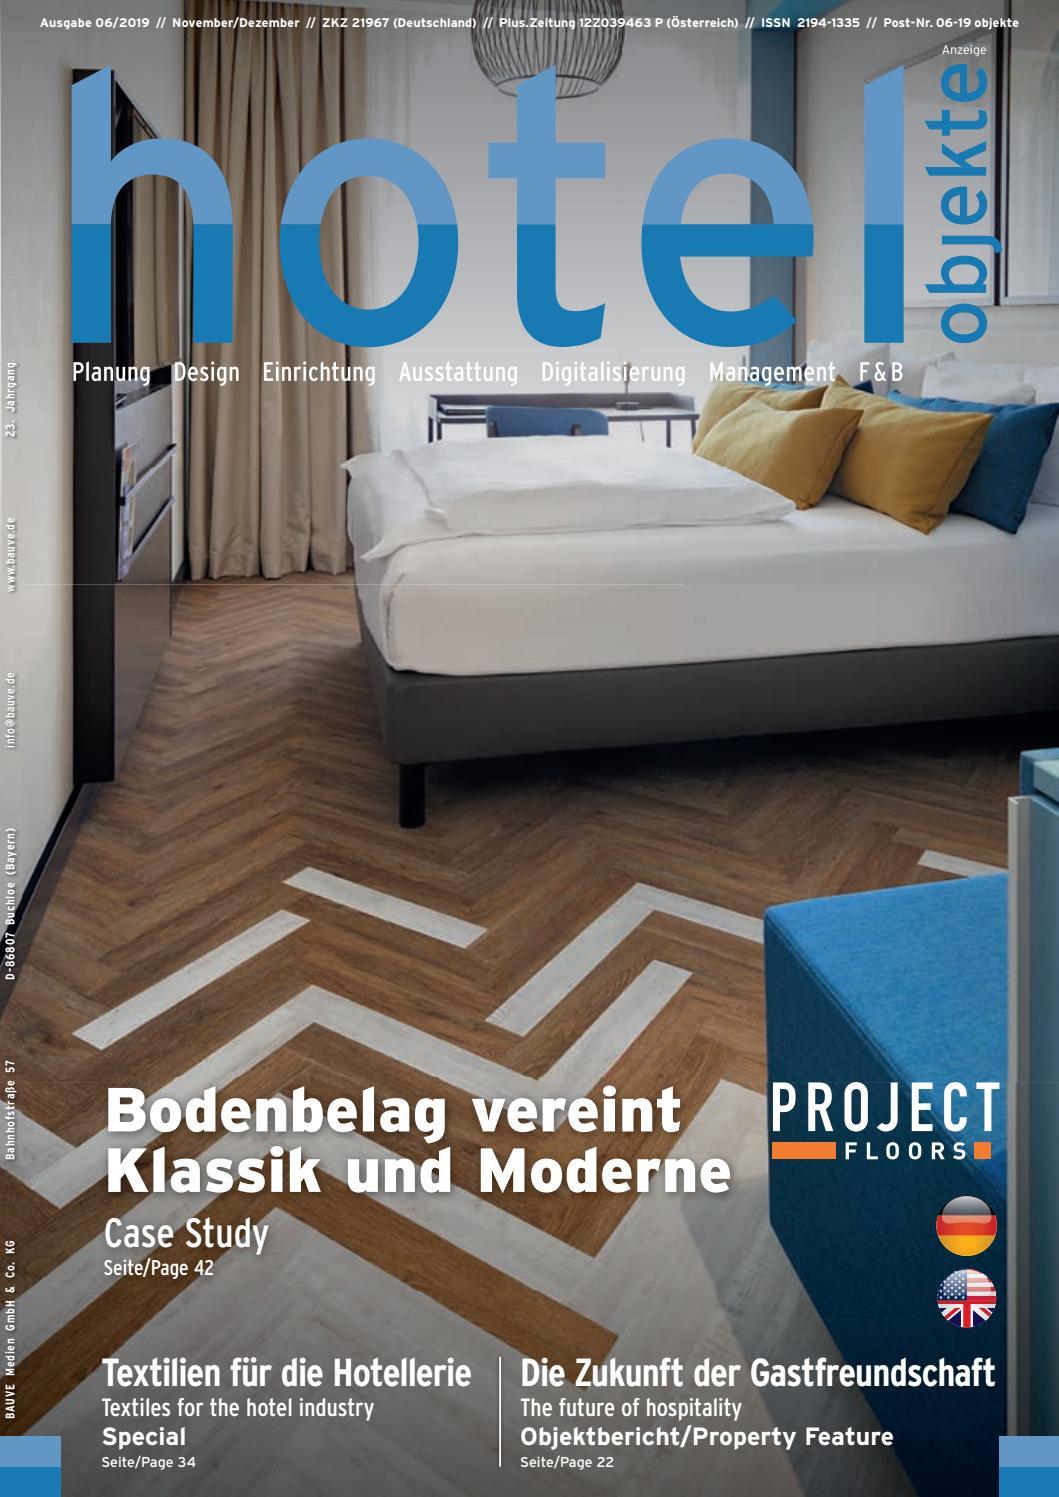 Hotel Objekte 06 2019 By Bauve Medien Gmbh Co Kg Issuu